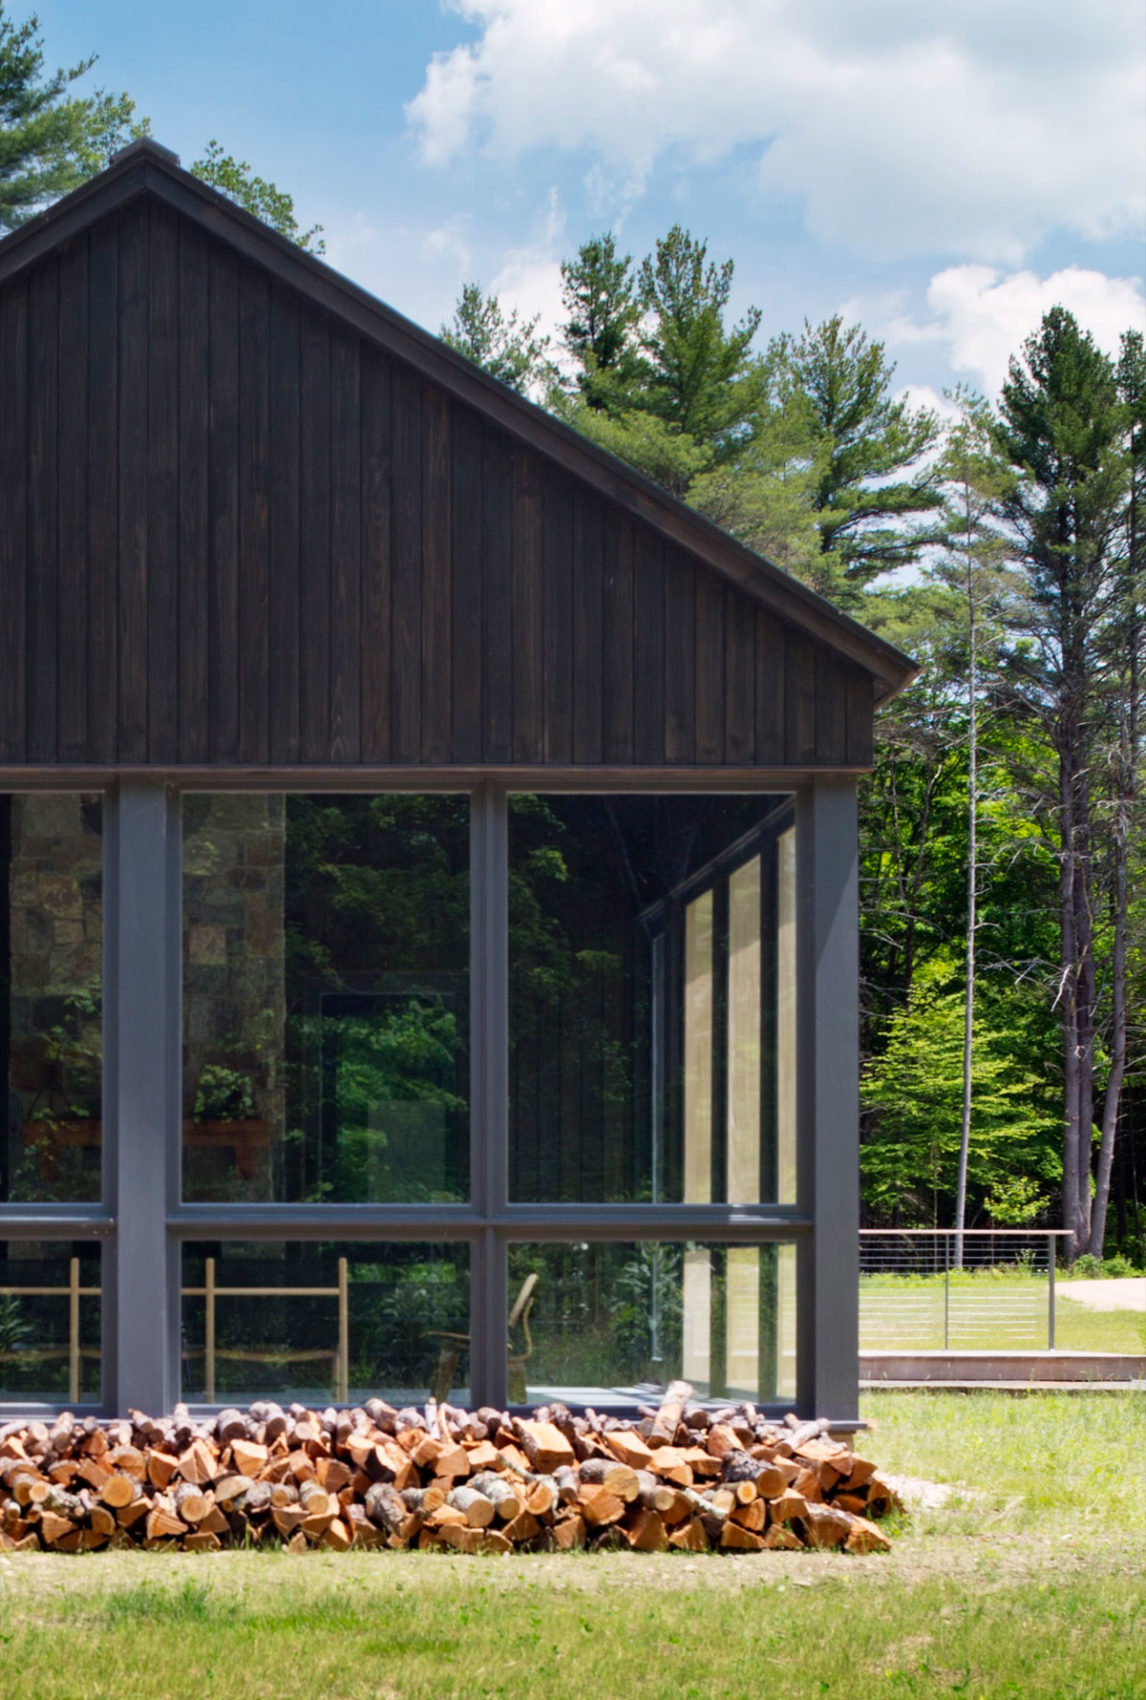 Undermountain by O'Neill Rose Architects (10)